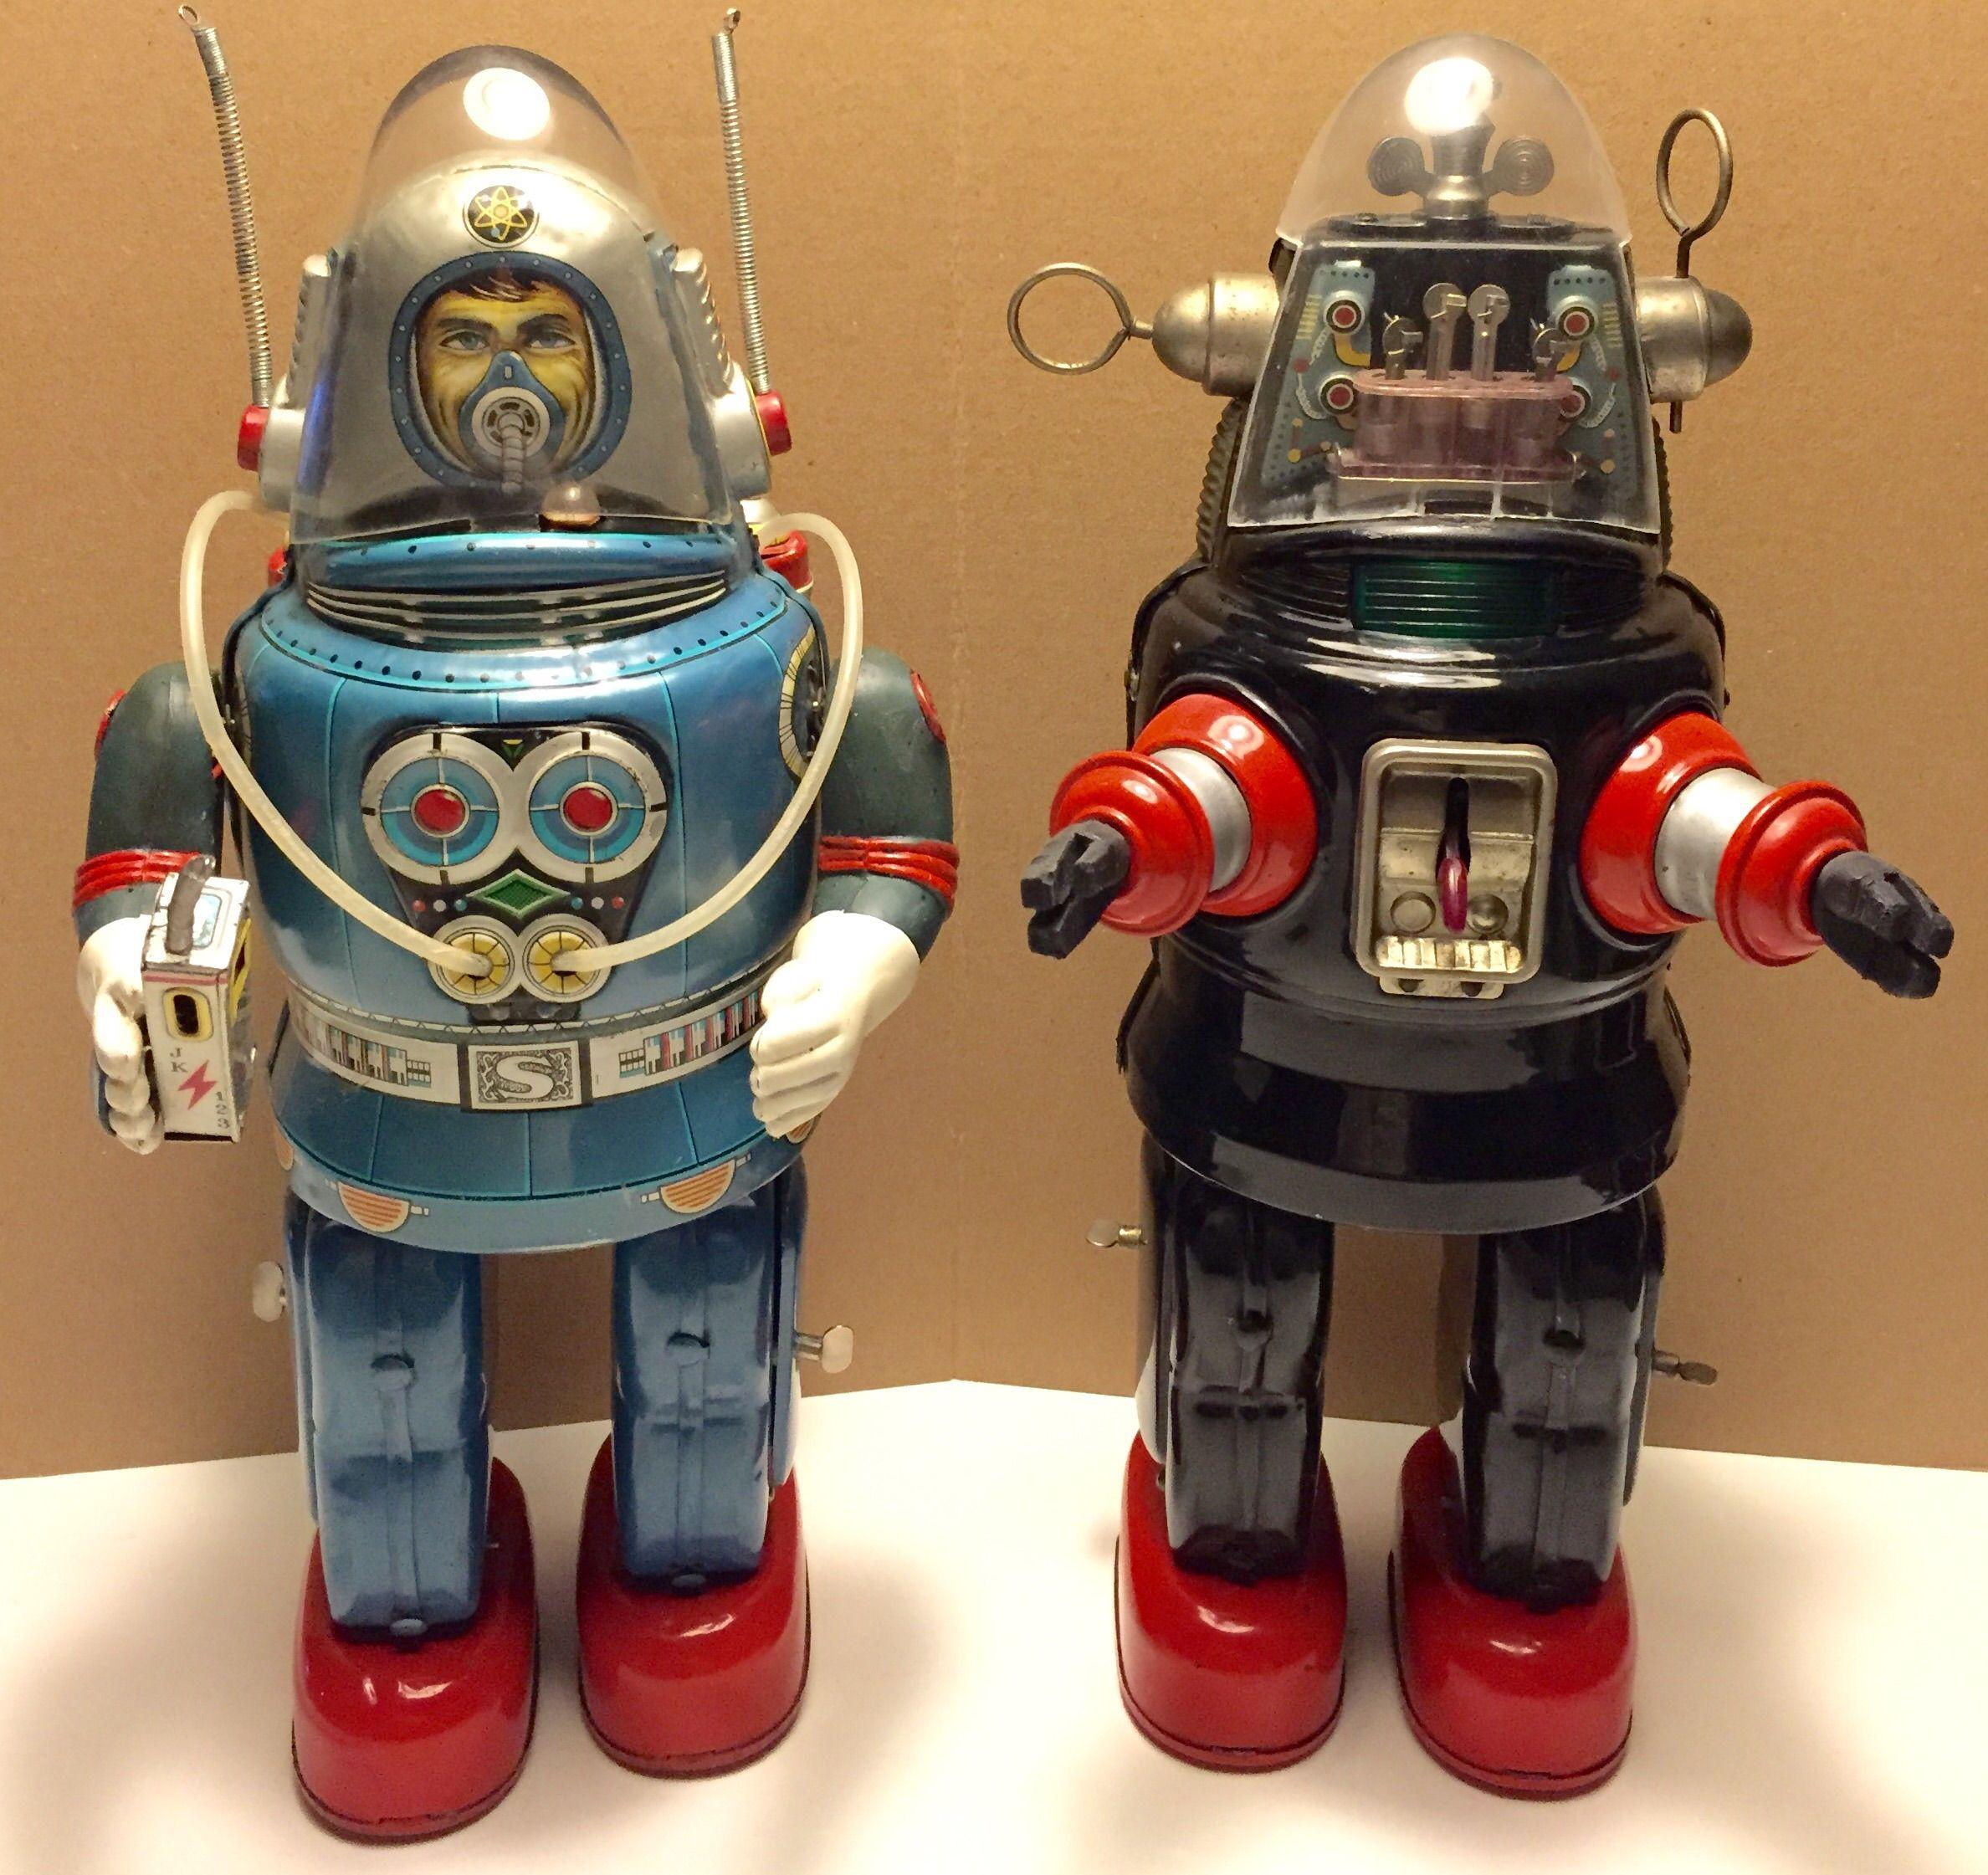 Nomura mechanized robot & rosko astronaut